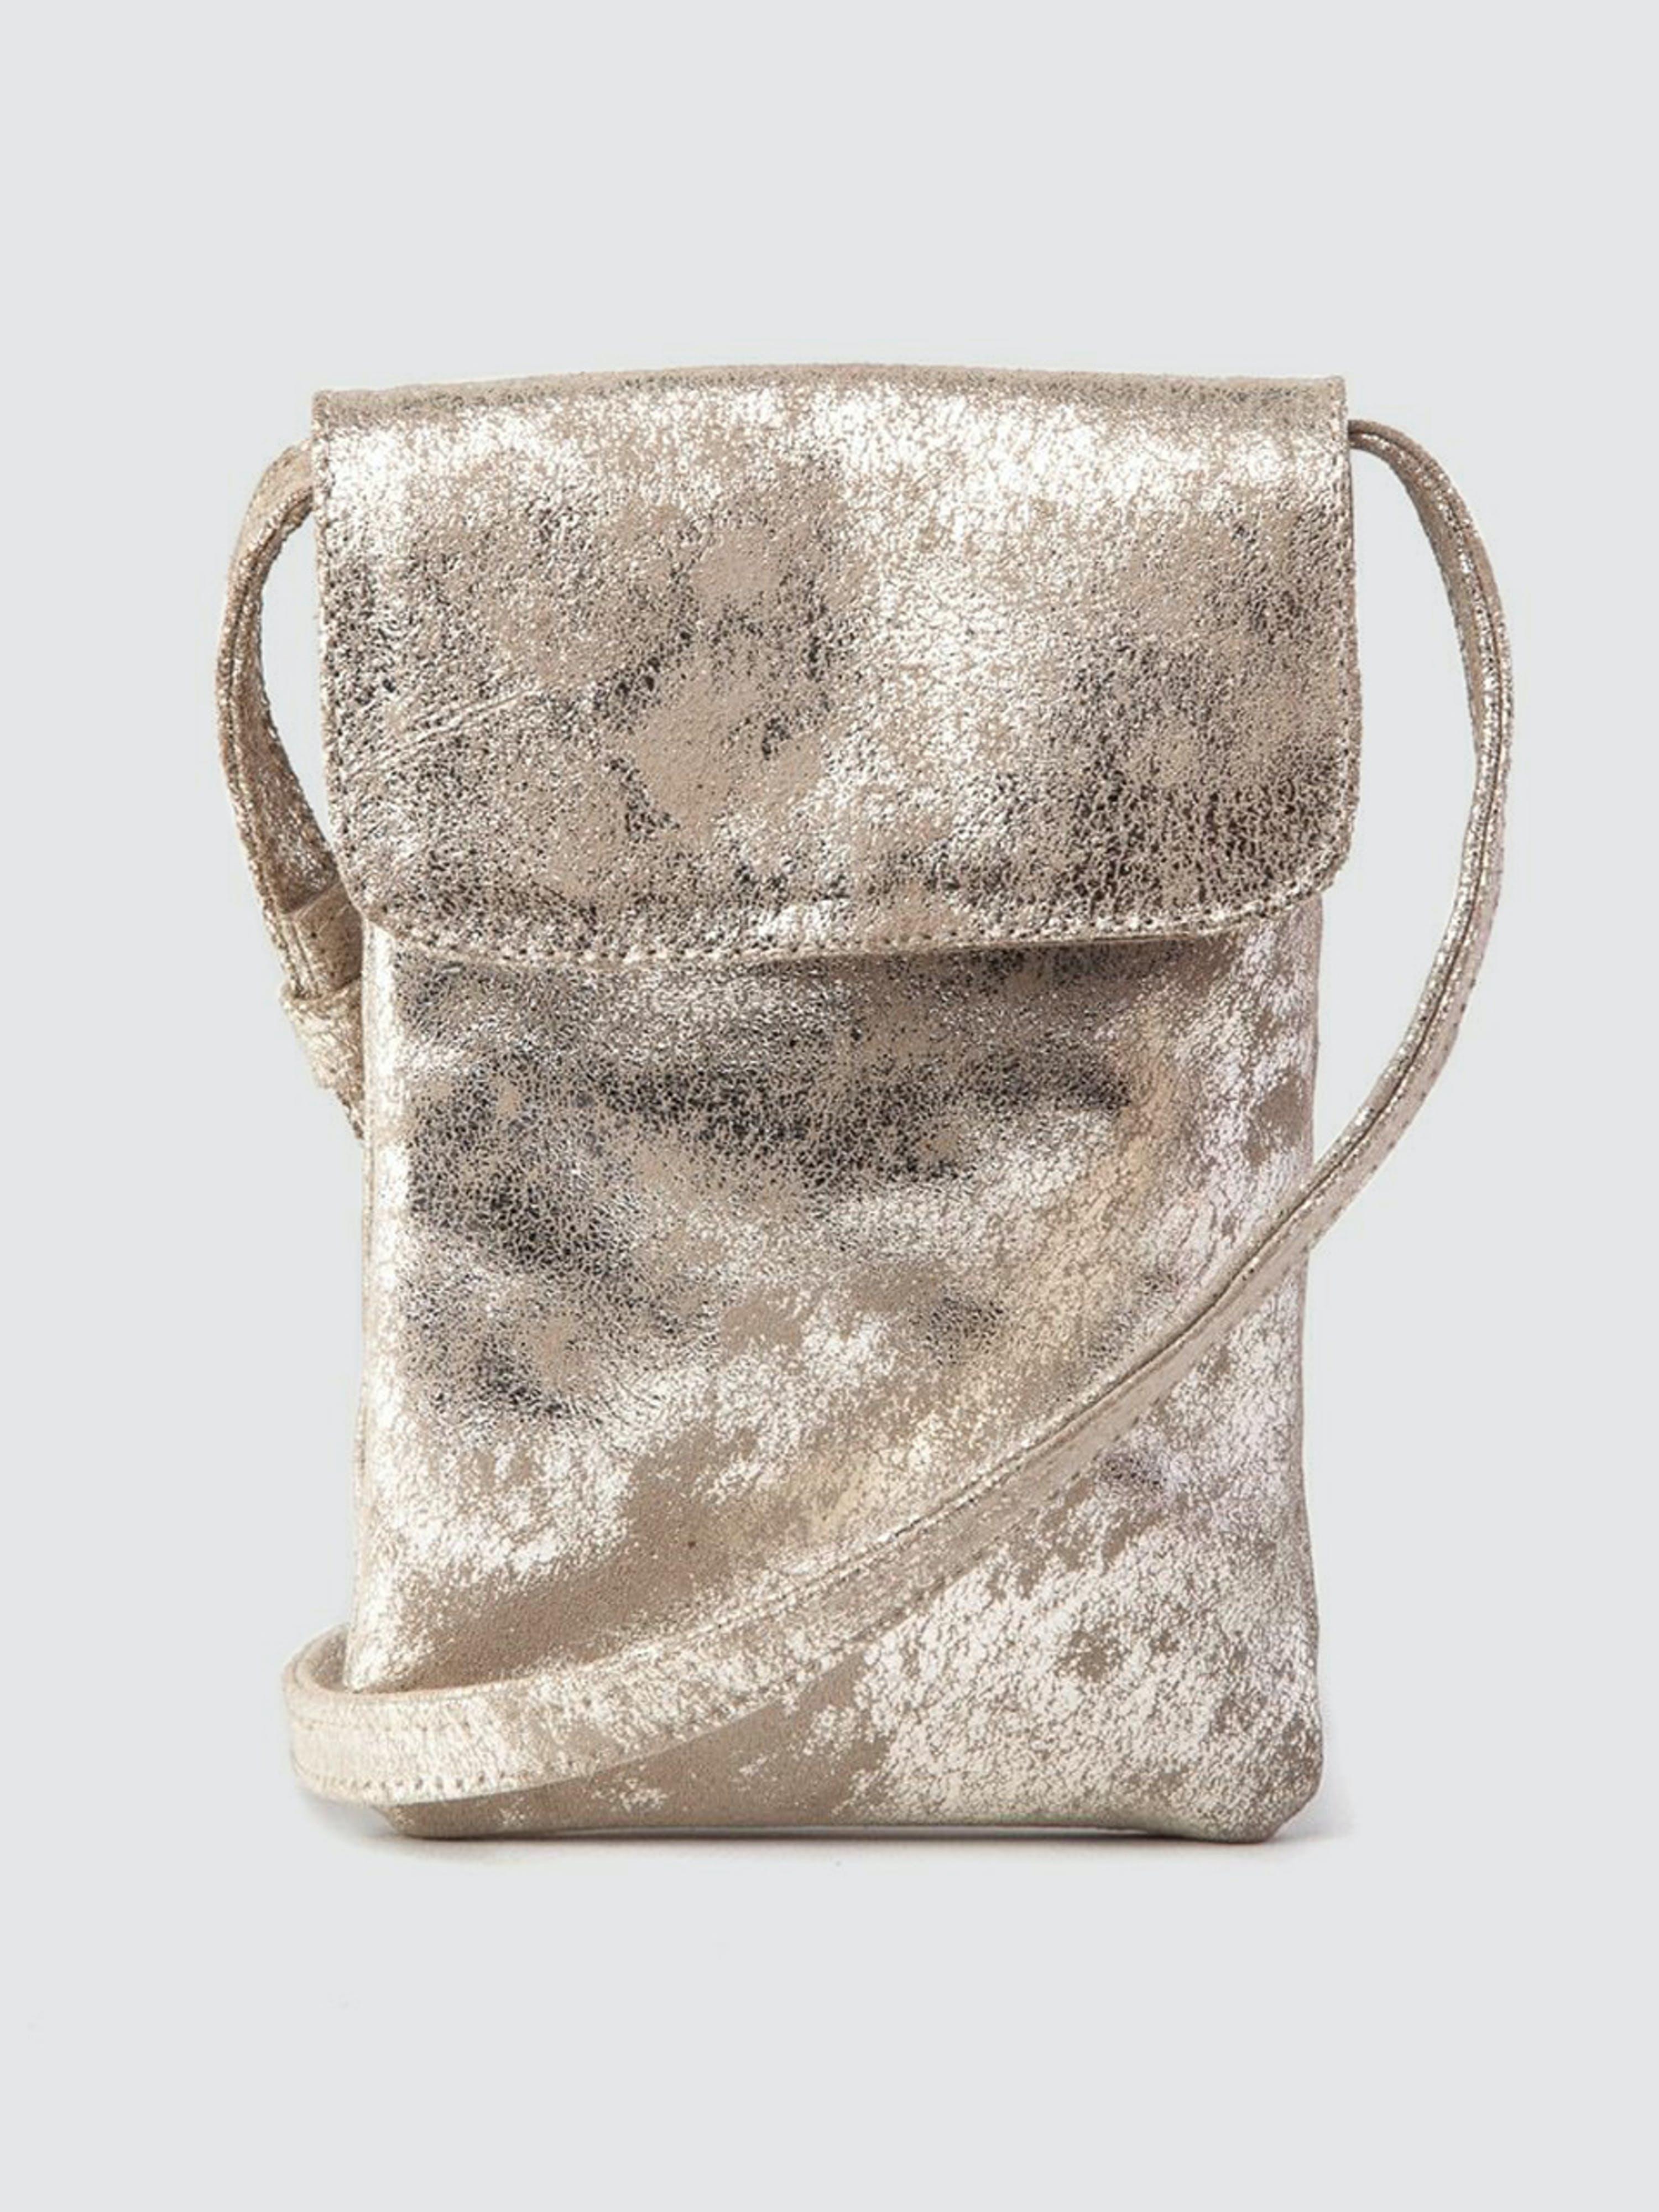 CoFi Leathers Penny Phone Bag: Platinum  - Grey